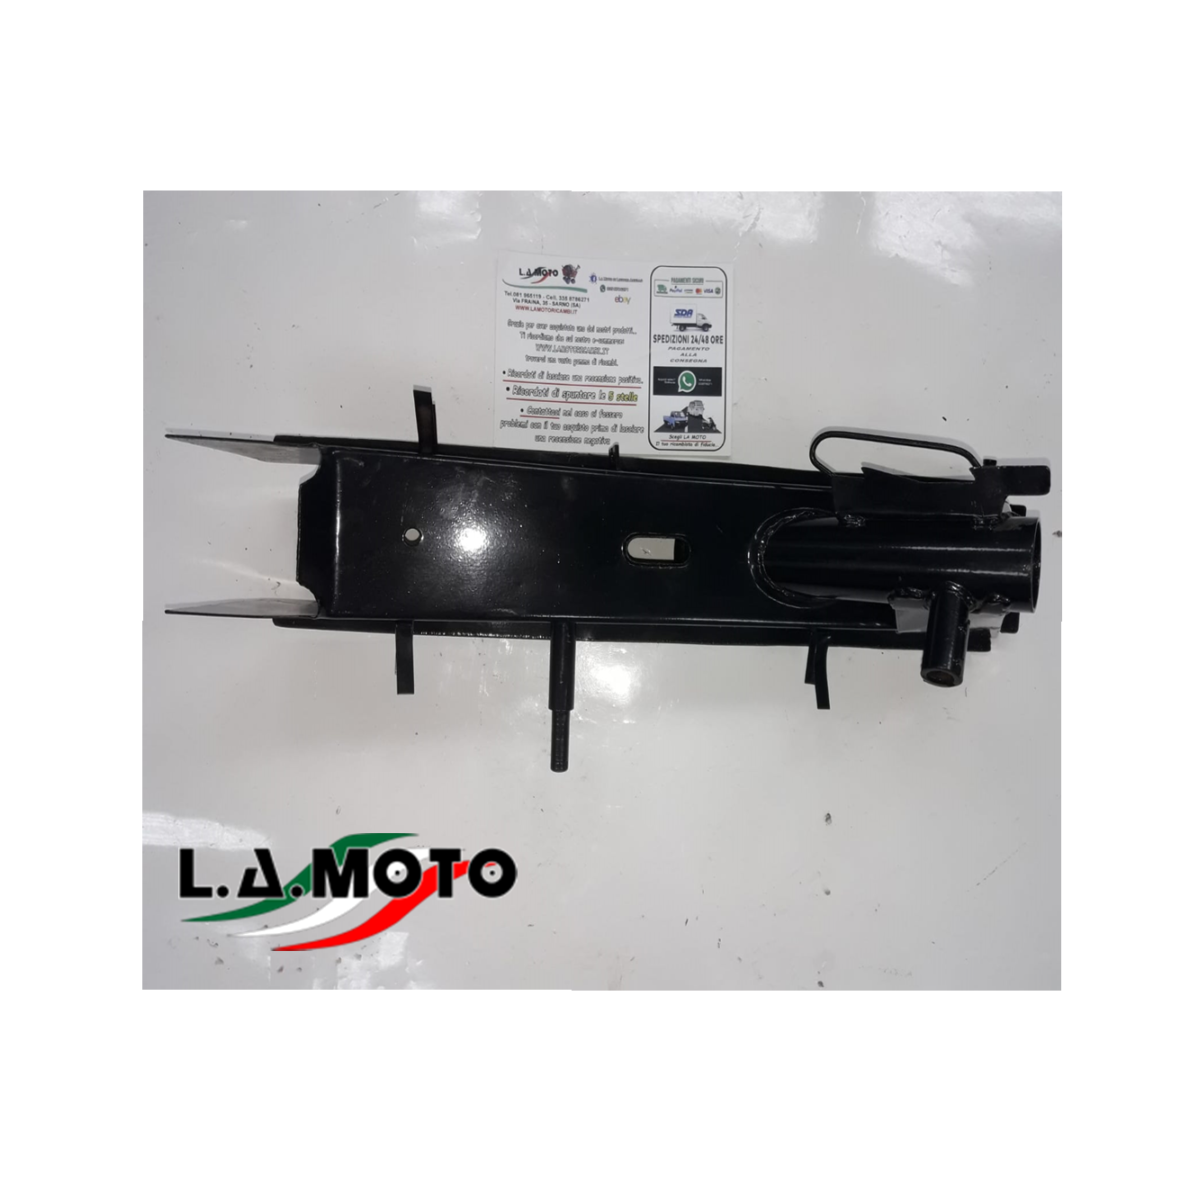 SLE33 – Traversa posteriore pavimento cabina